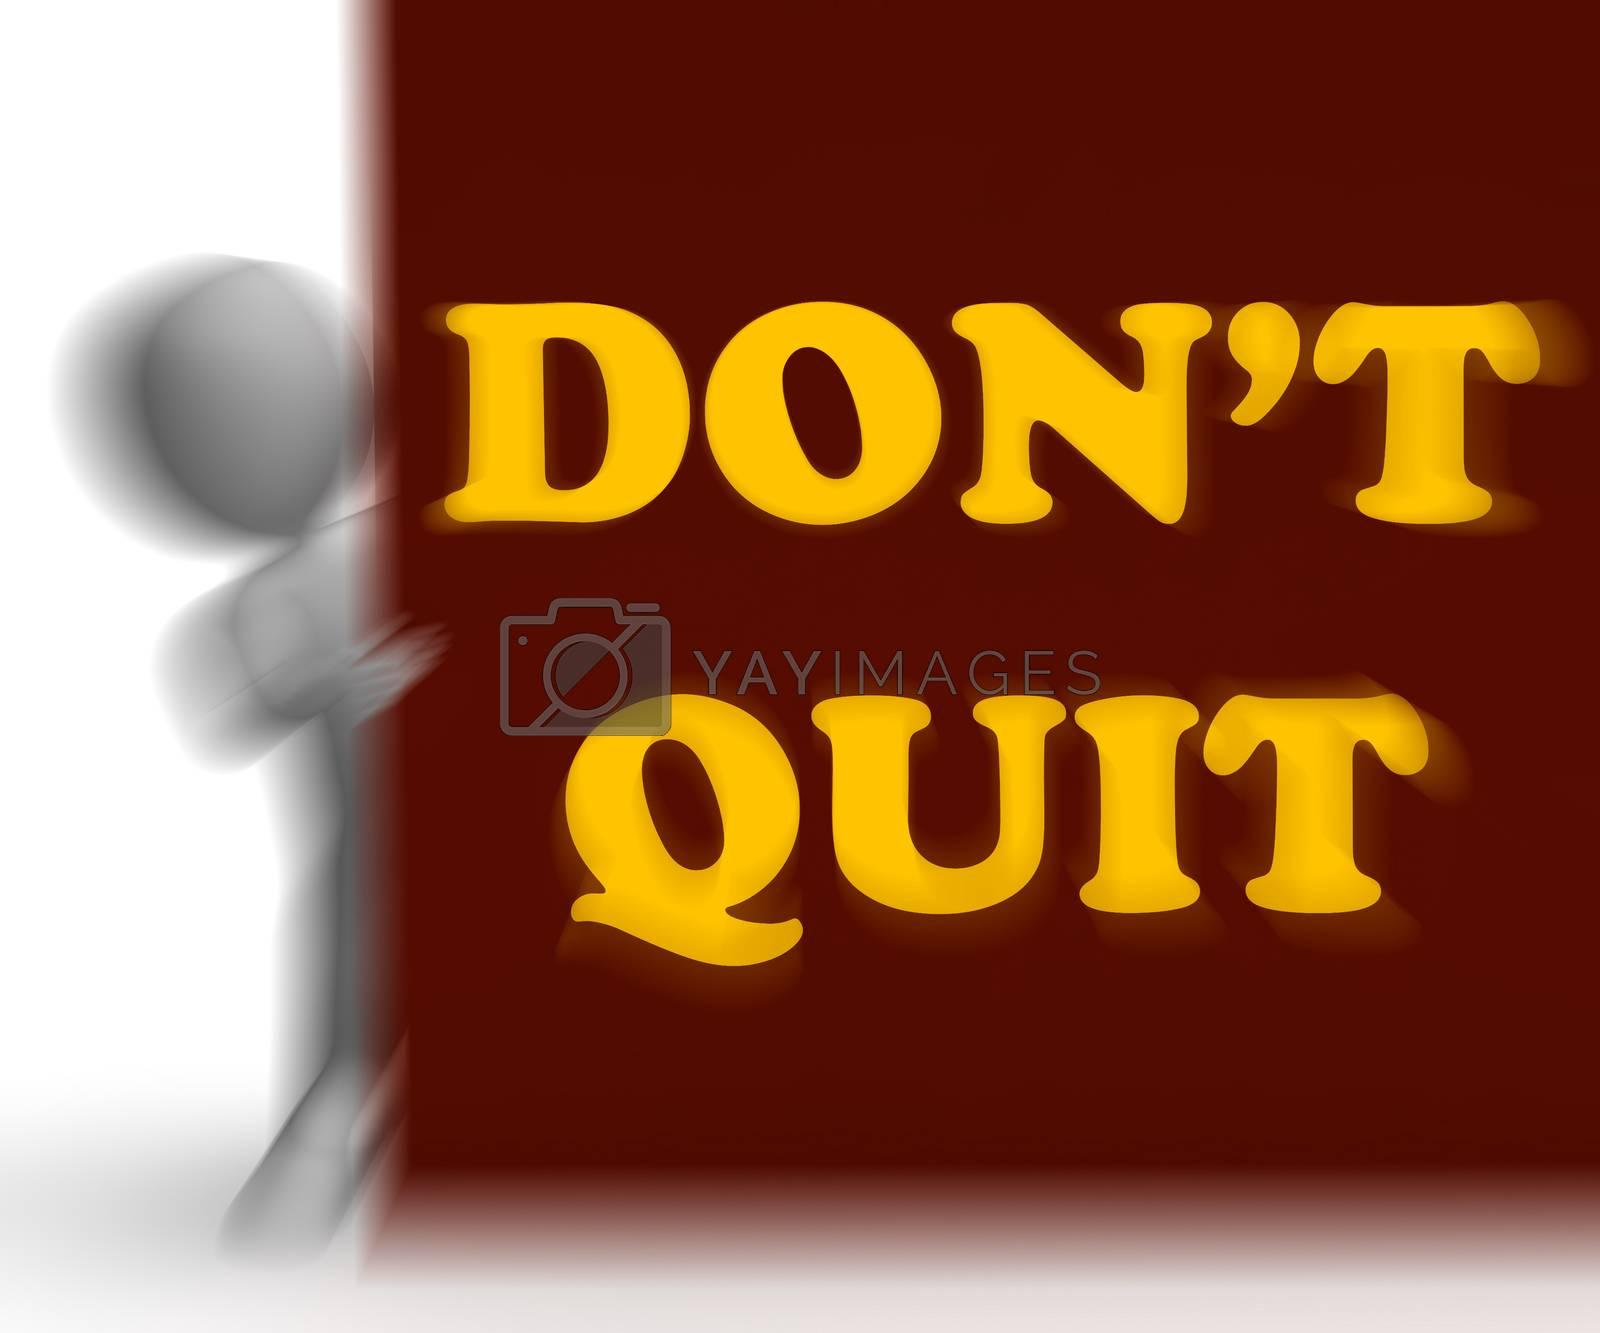 Dont Quit Placard Shows Motivation And Determination by stuartmiles